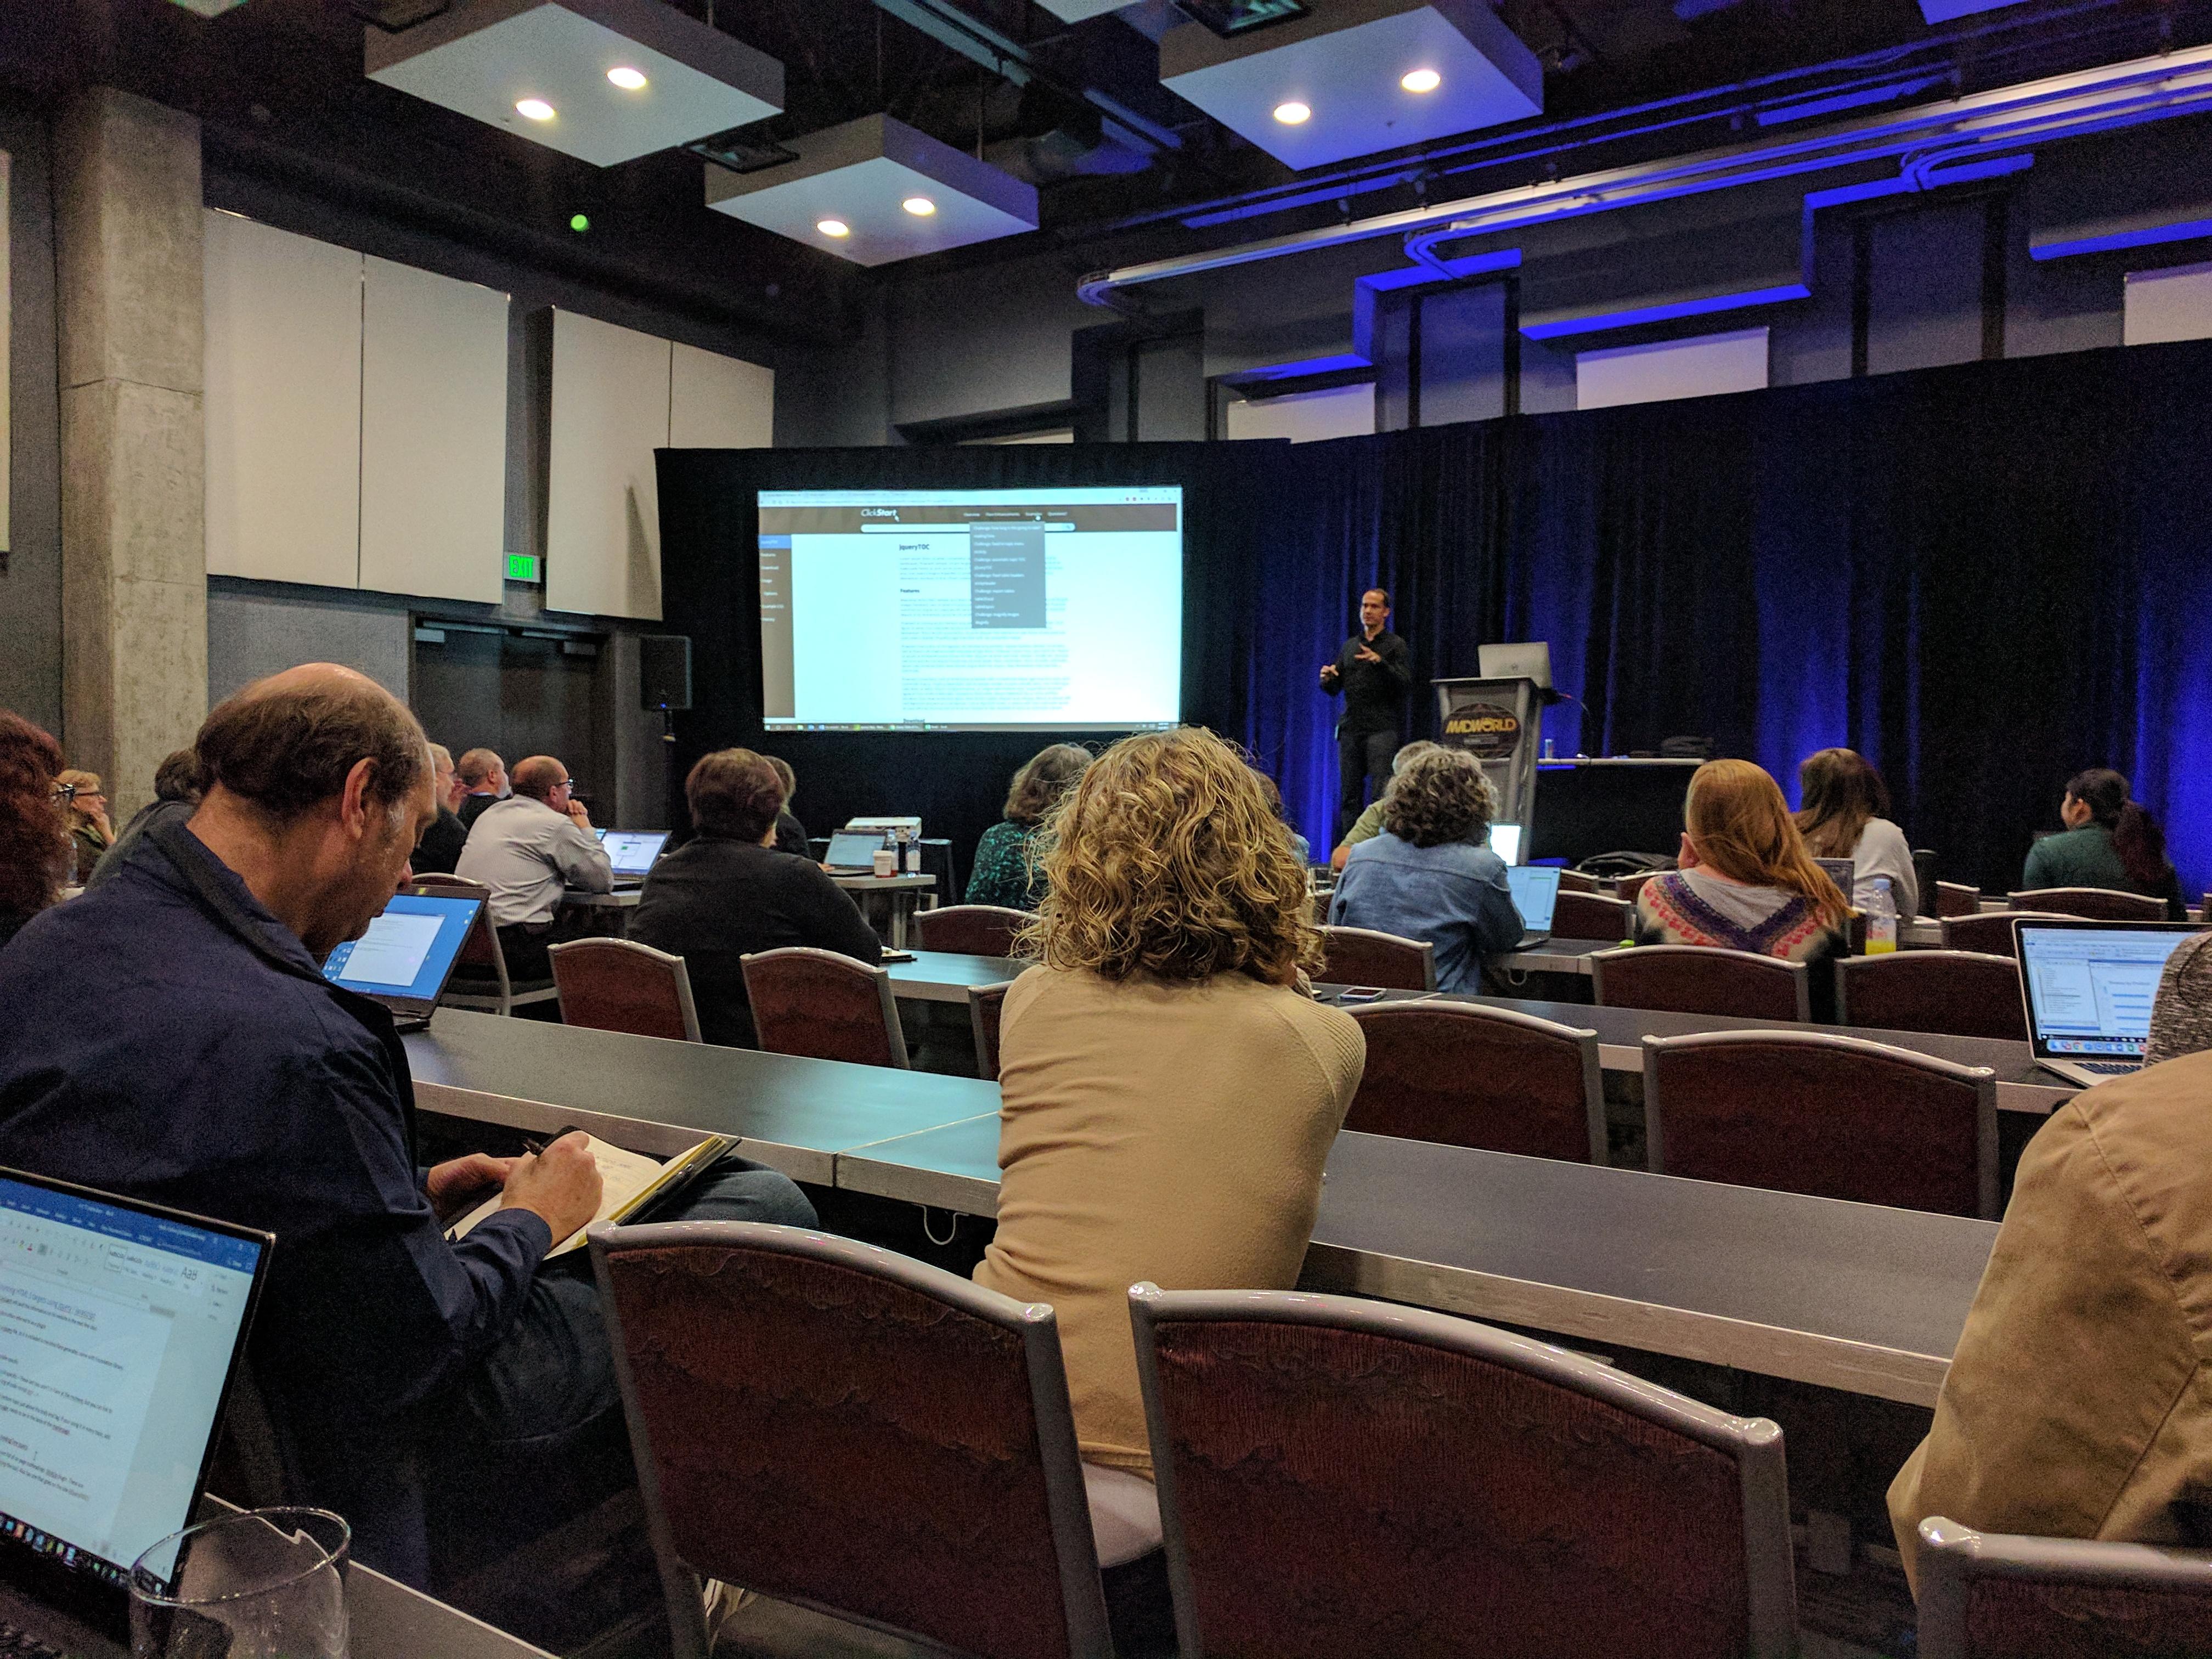 MadWorld 2017 HMTL5 and JQuery presentation by Scott DeLoach